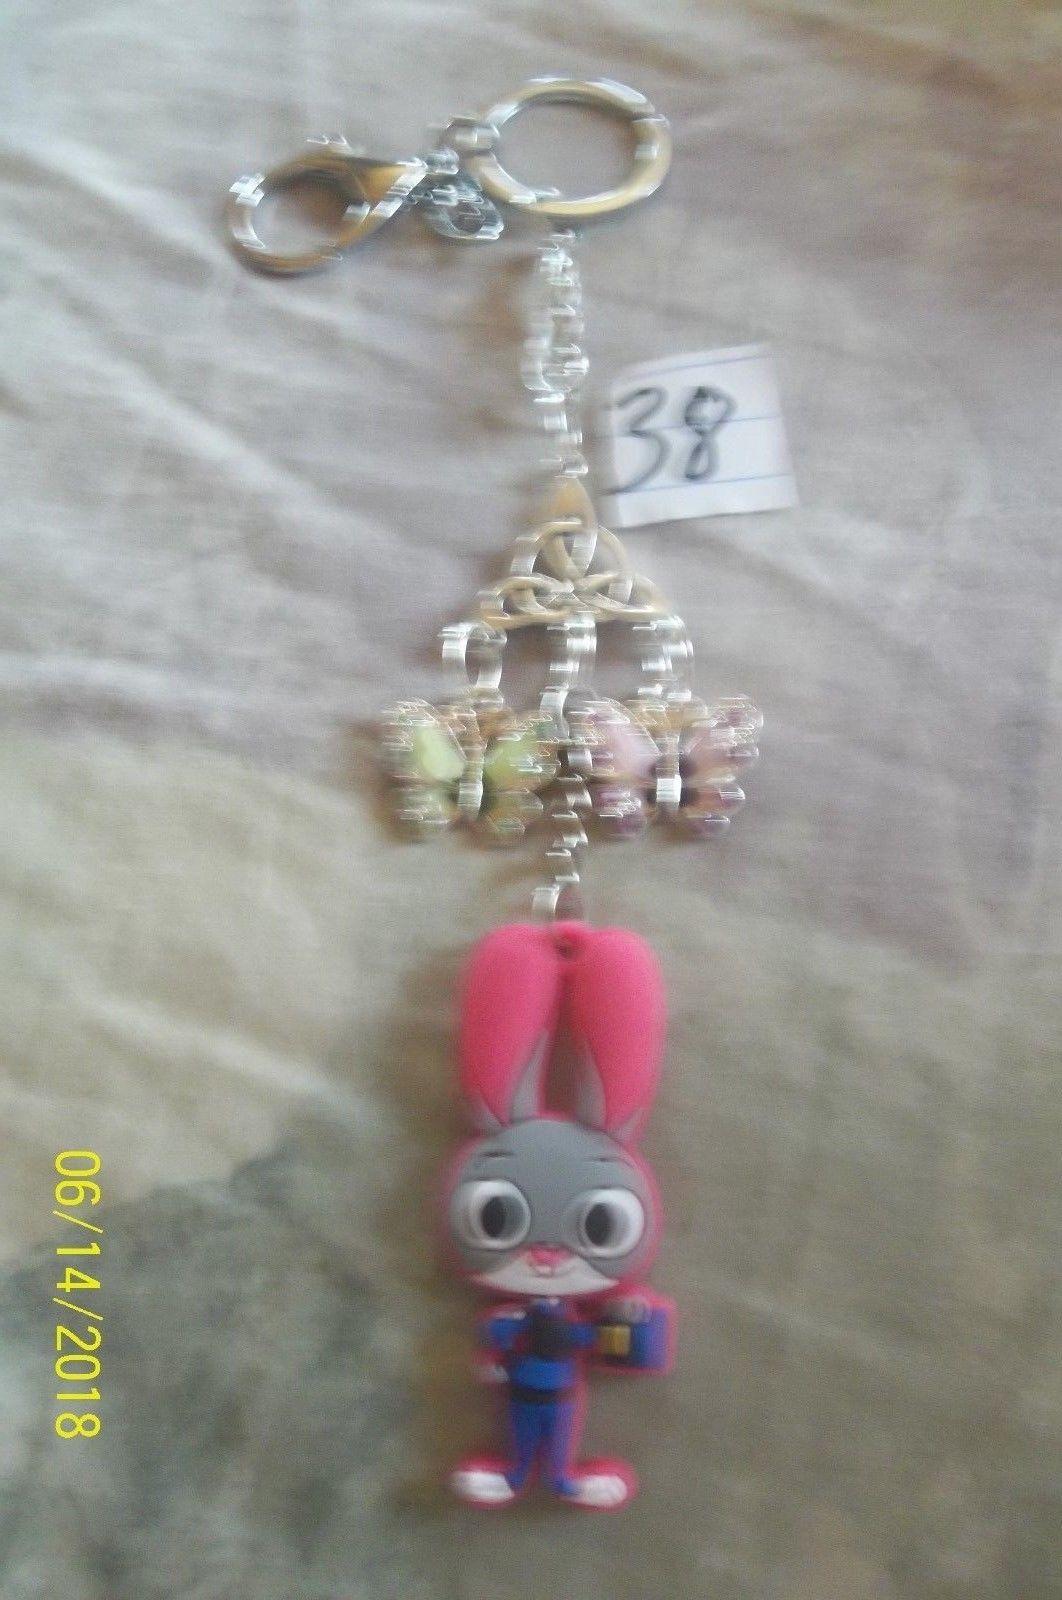 # purse jewlrey silver color Hopps  keychain backpack filigree dangle charm #38 image 2